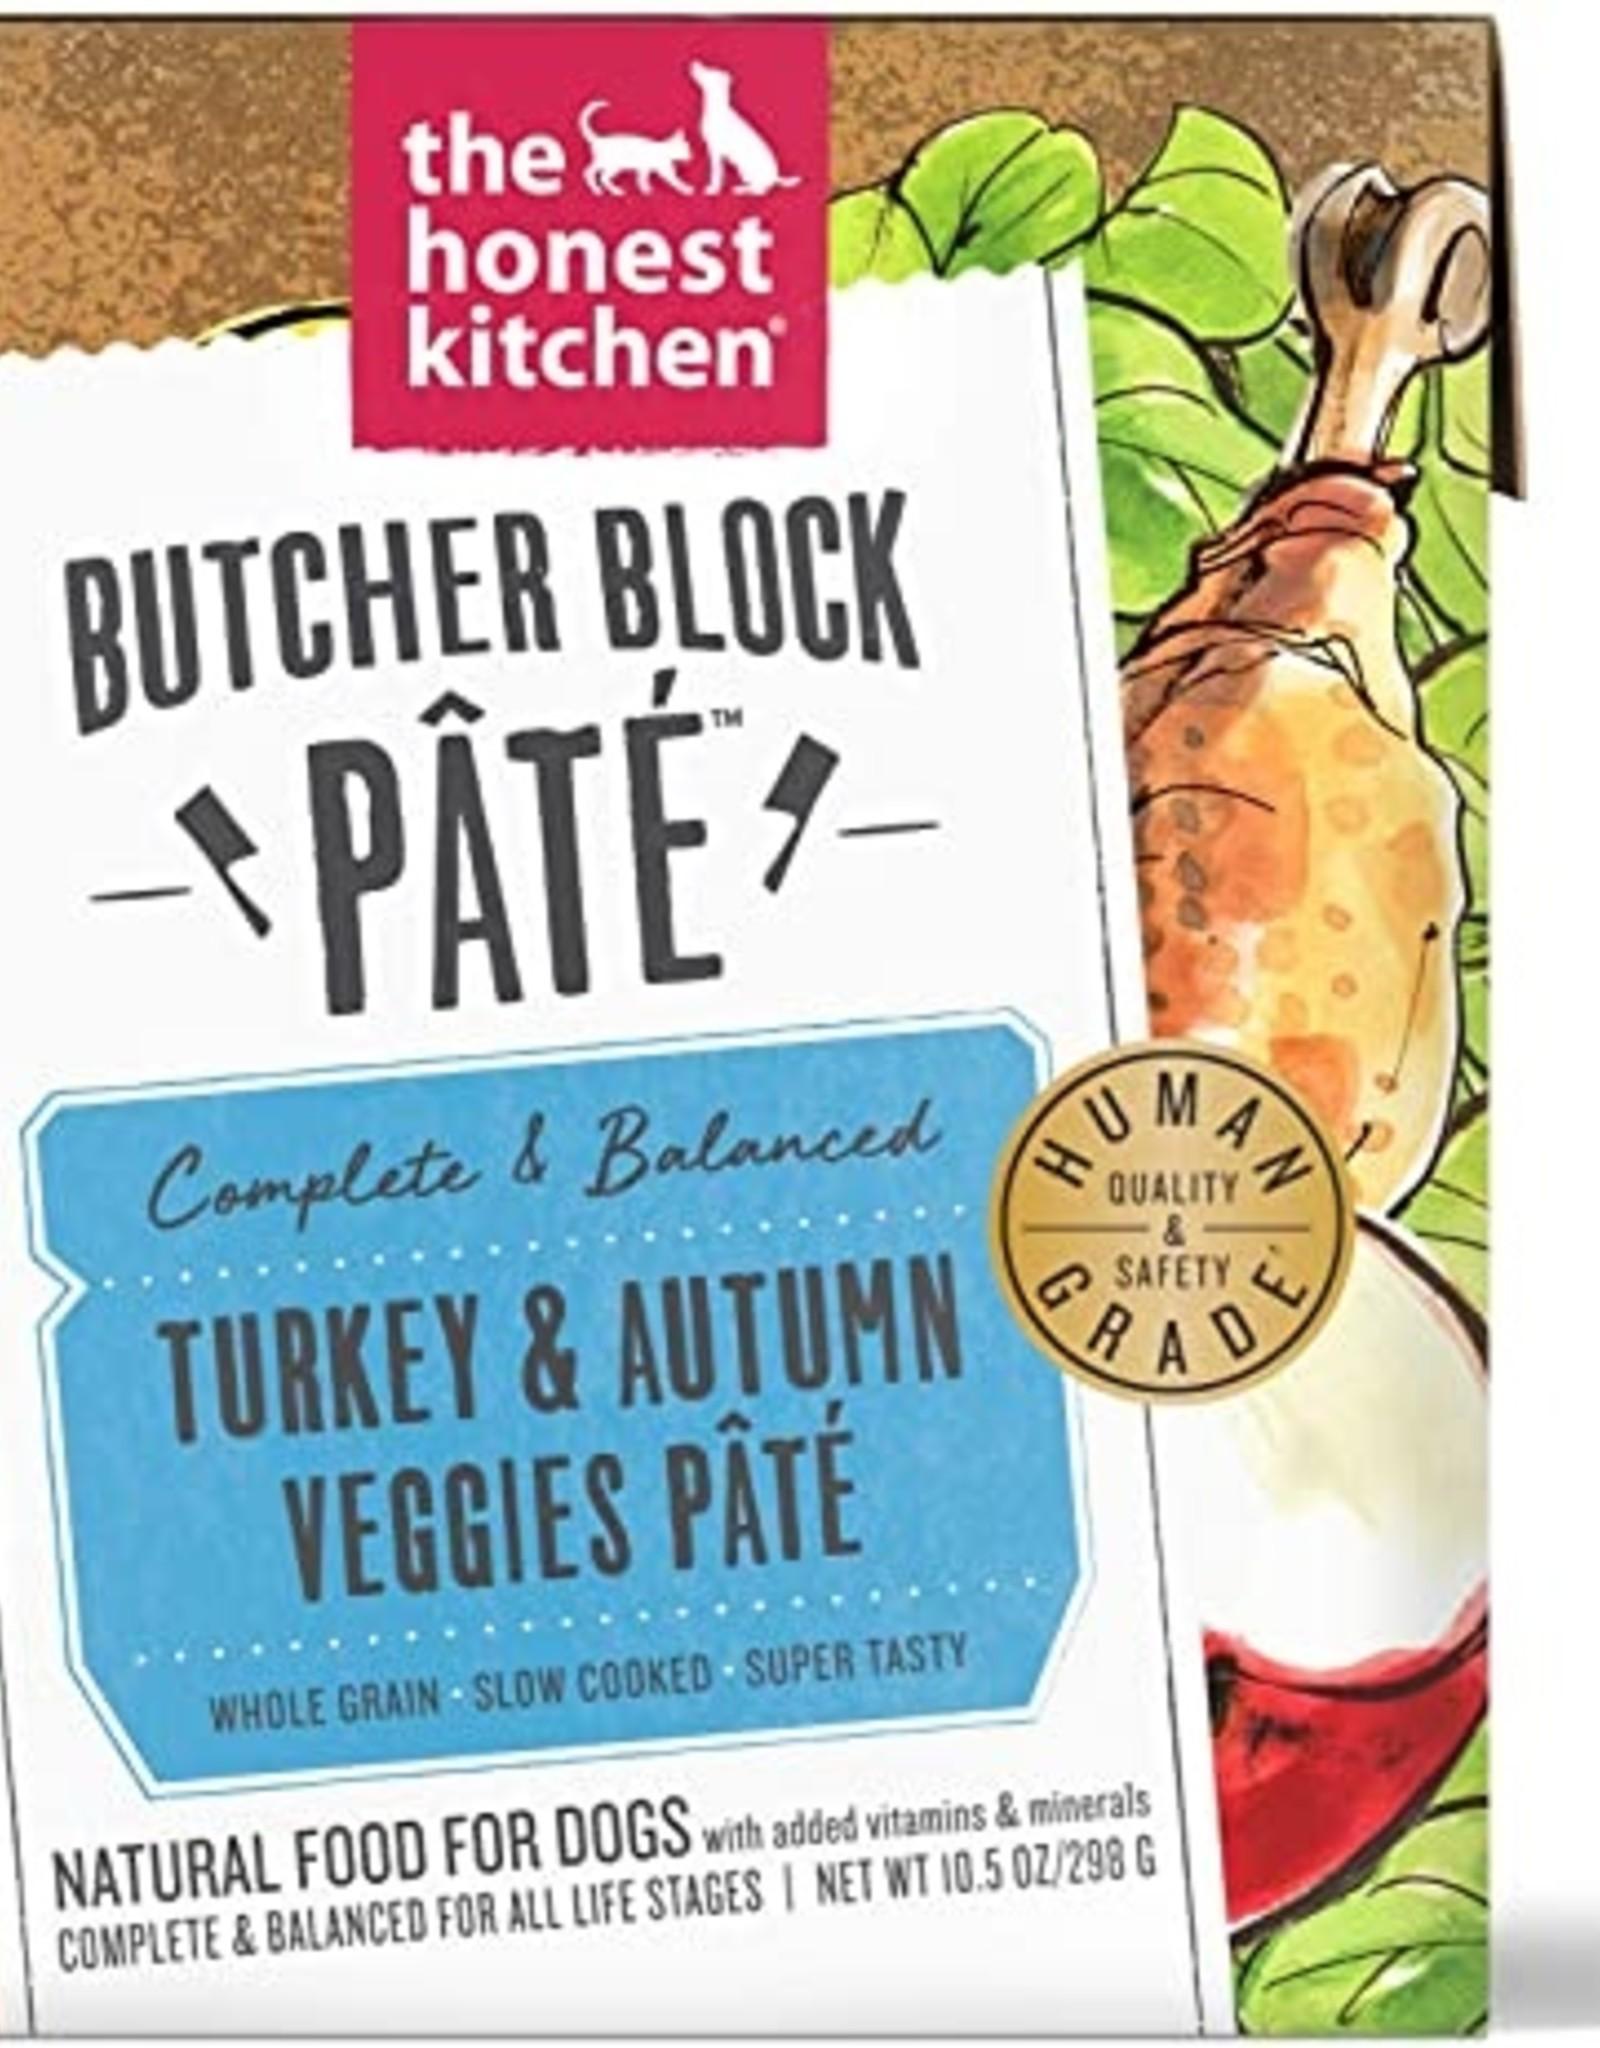 The Honest Kitchen Dog Turkey & Autumn Veggies Pate - Whole Grain 10.5oz